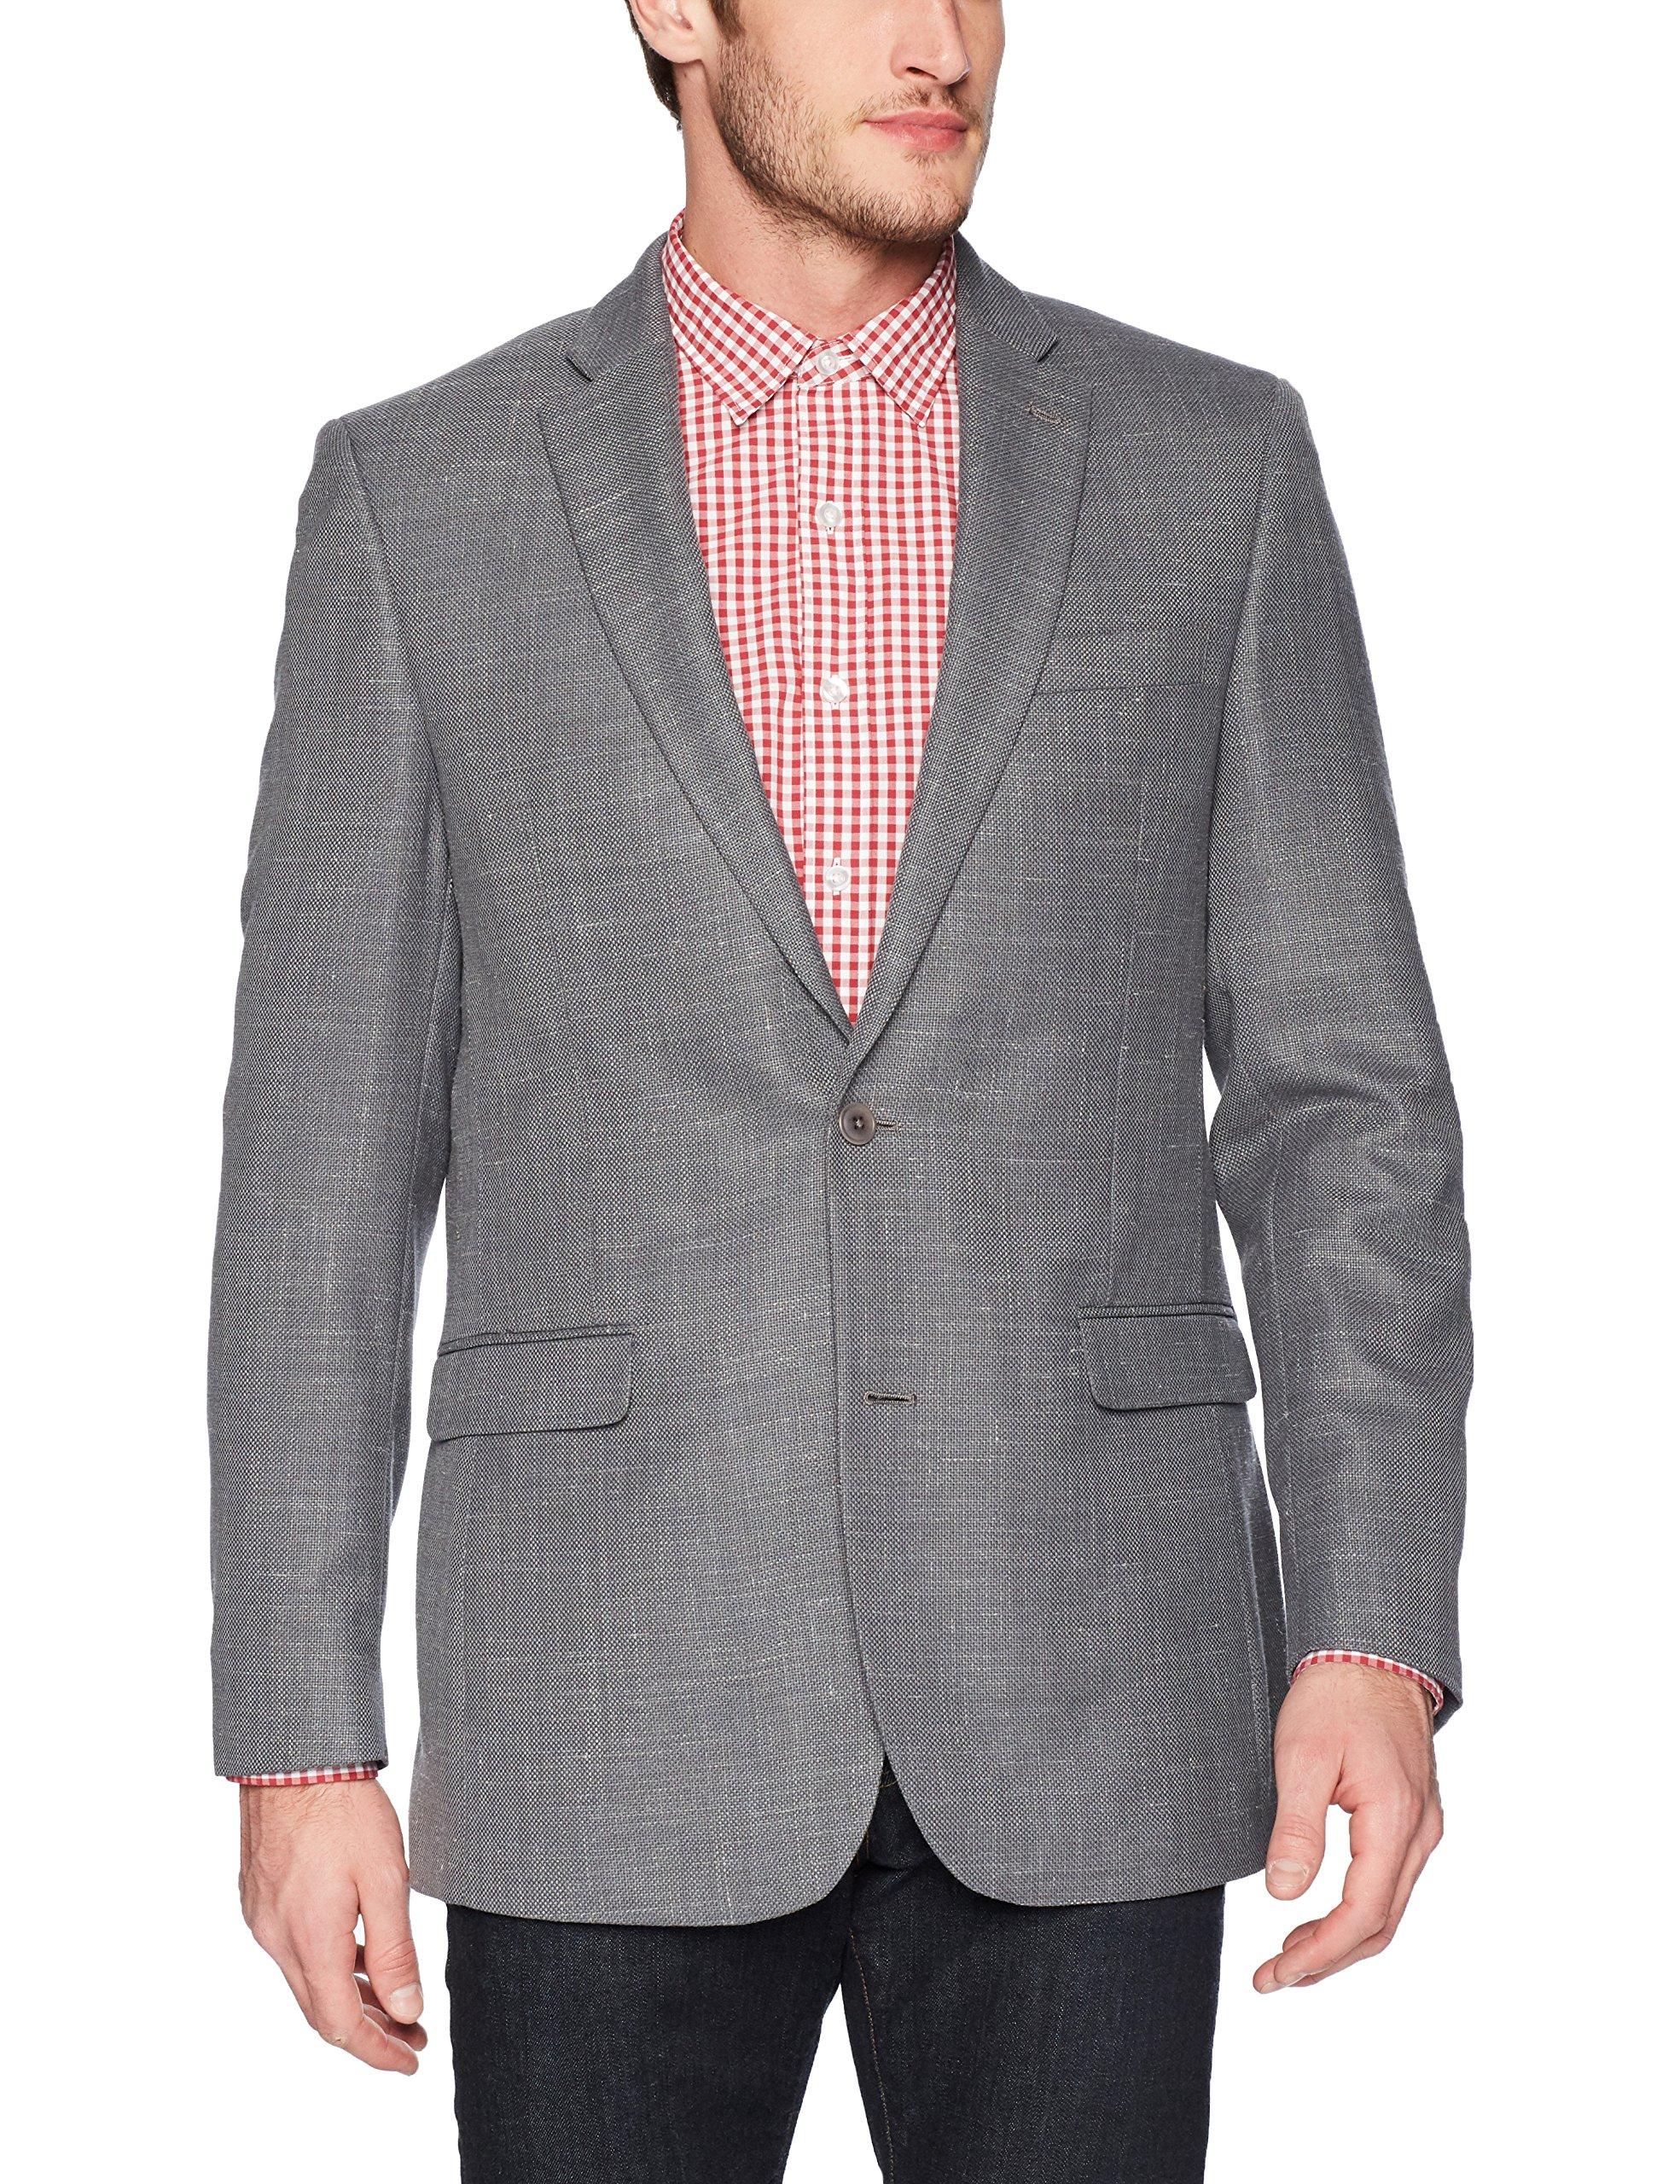 Tommy Hilfiger Men's Single Breast Solid Two Button Blazer, Gray Weave, 38 Regular